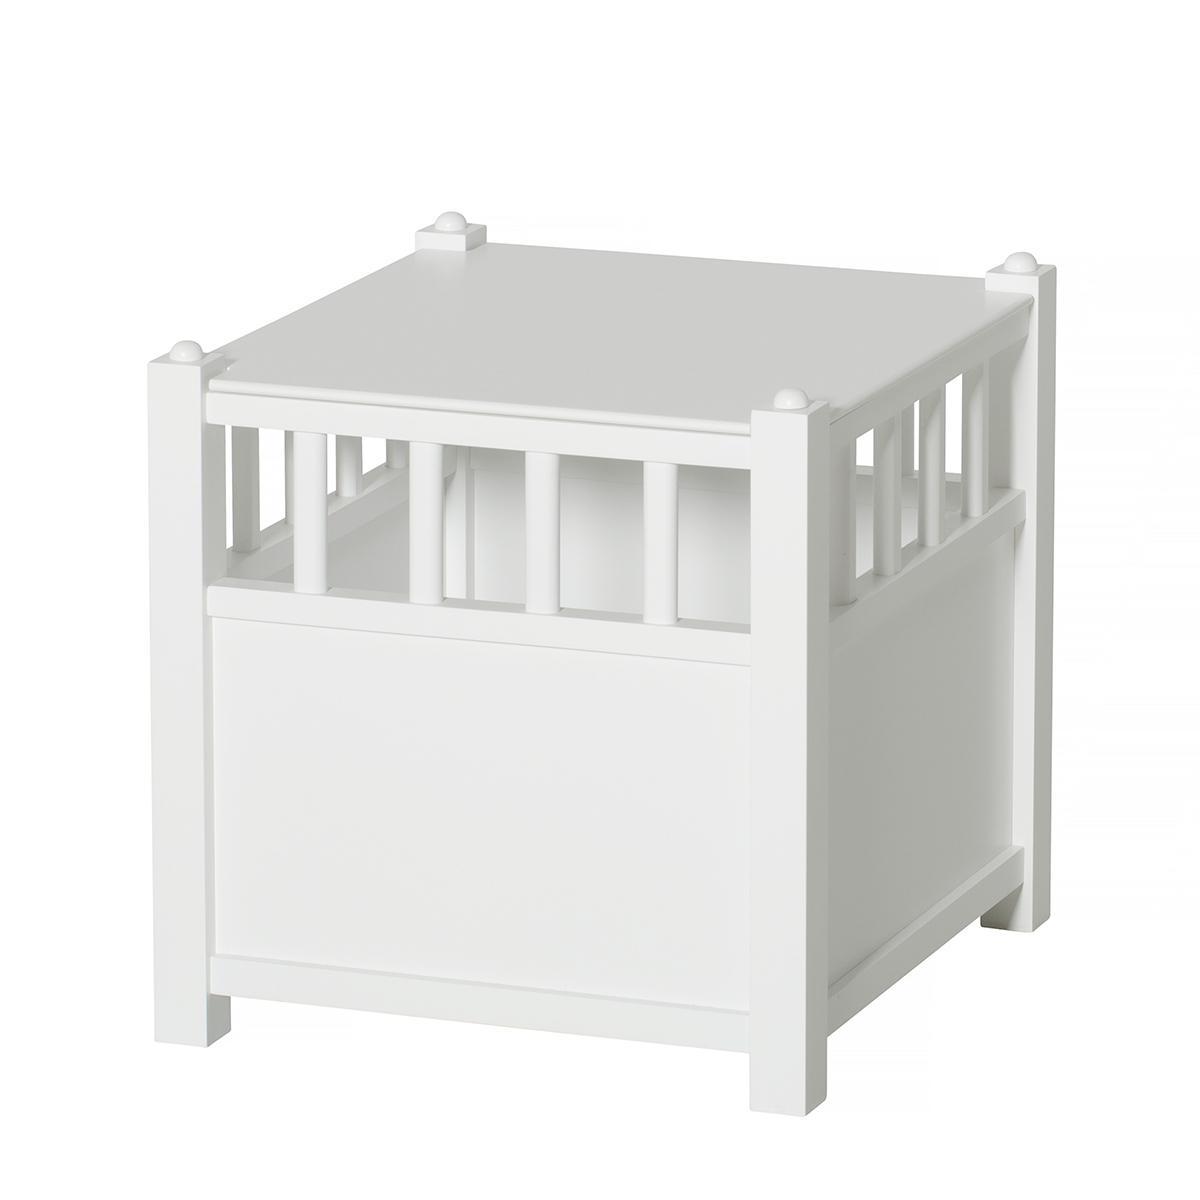 Cube rangement SEASIDE Oliver Furniture blanc